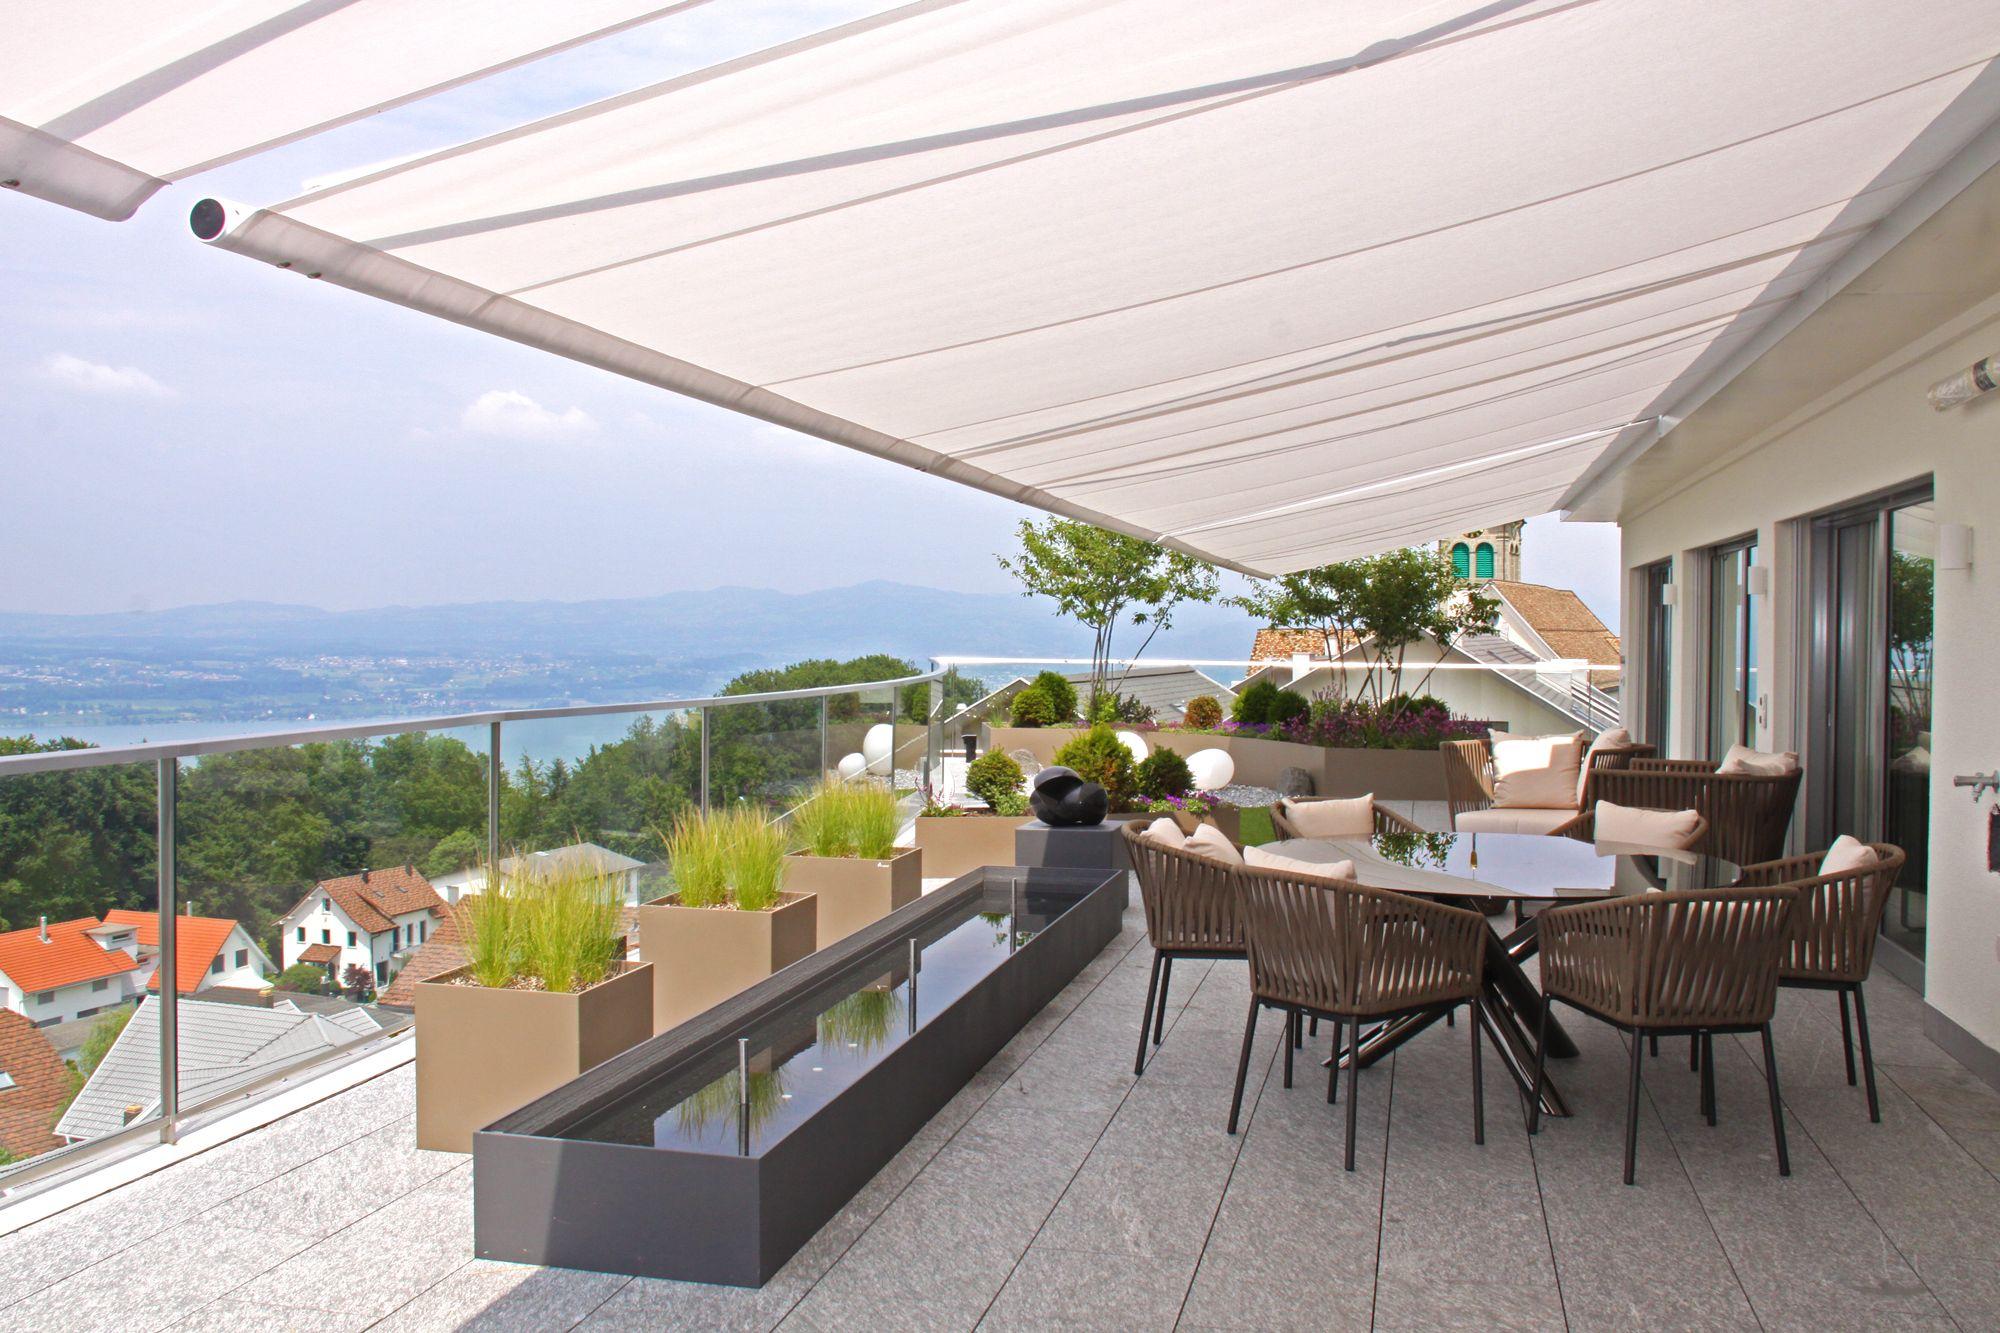 Terrasse Gestaltung terrassengestaltung aus rapperswil jona egli jona ag